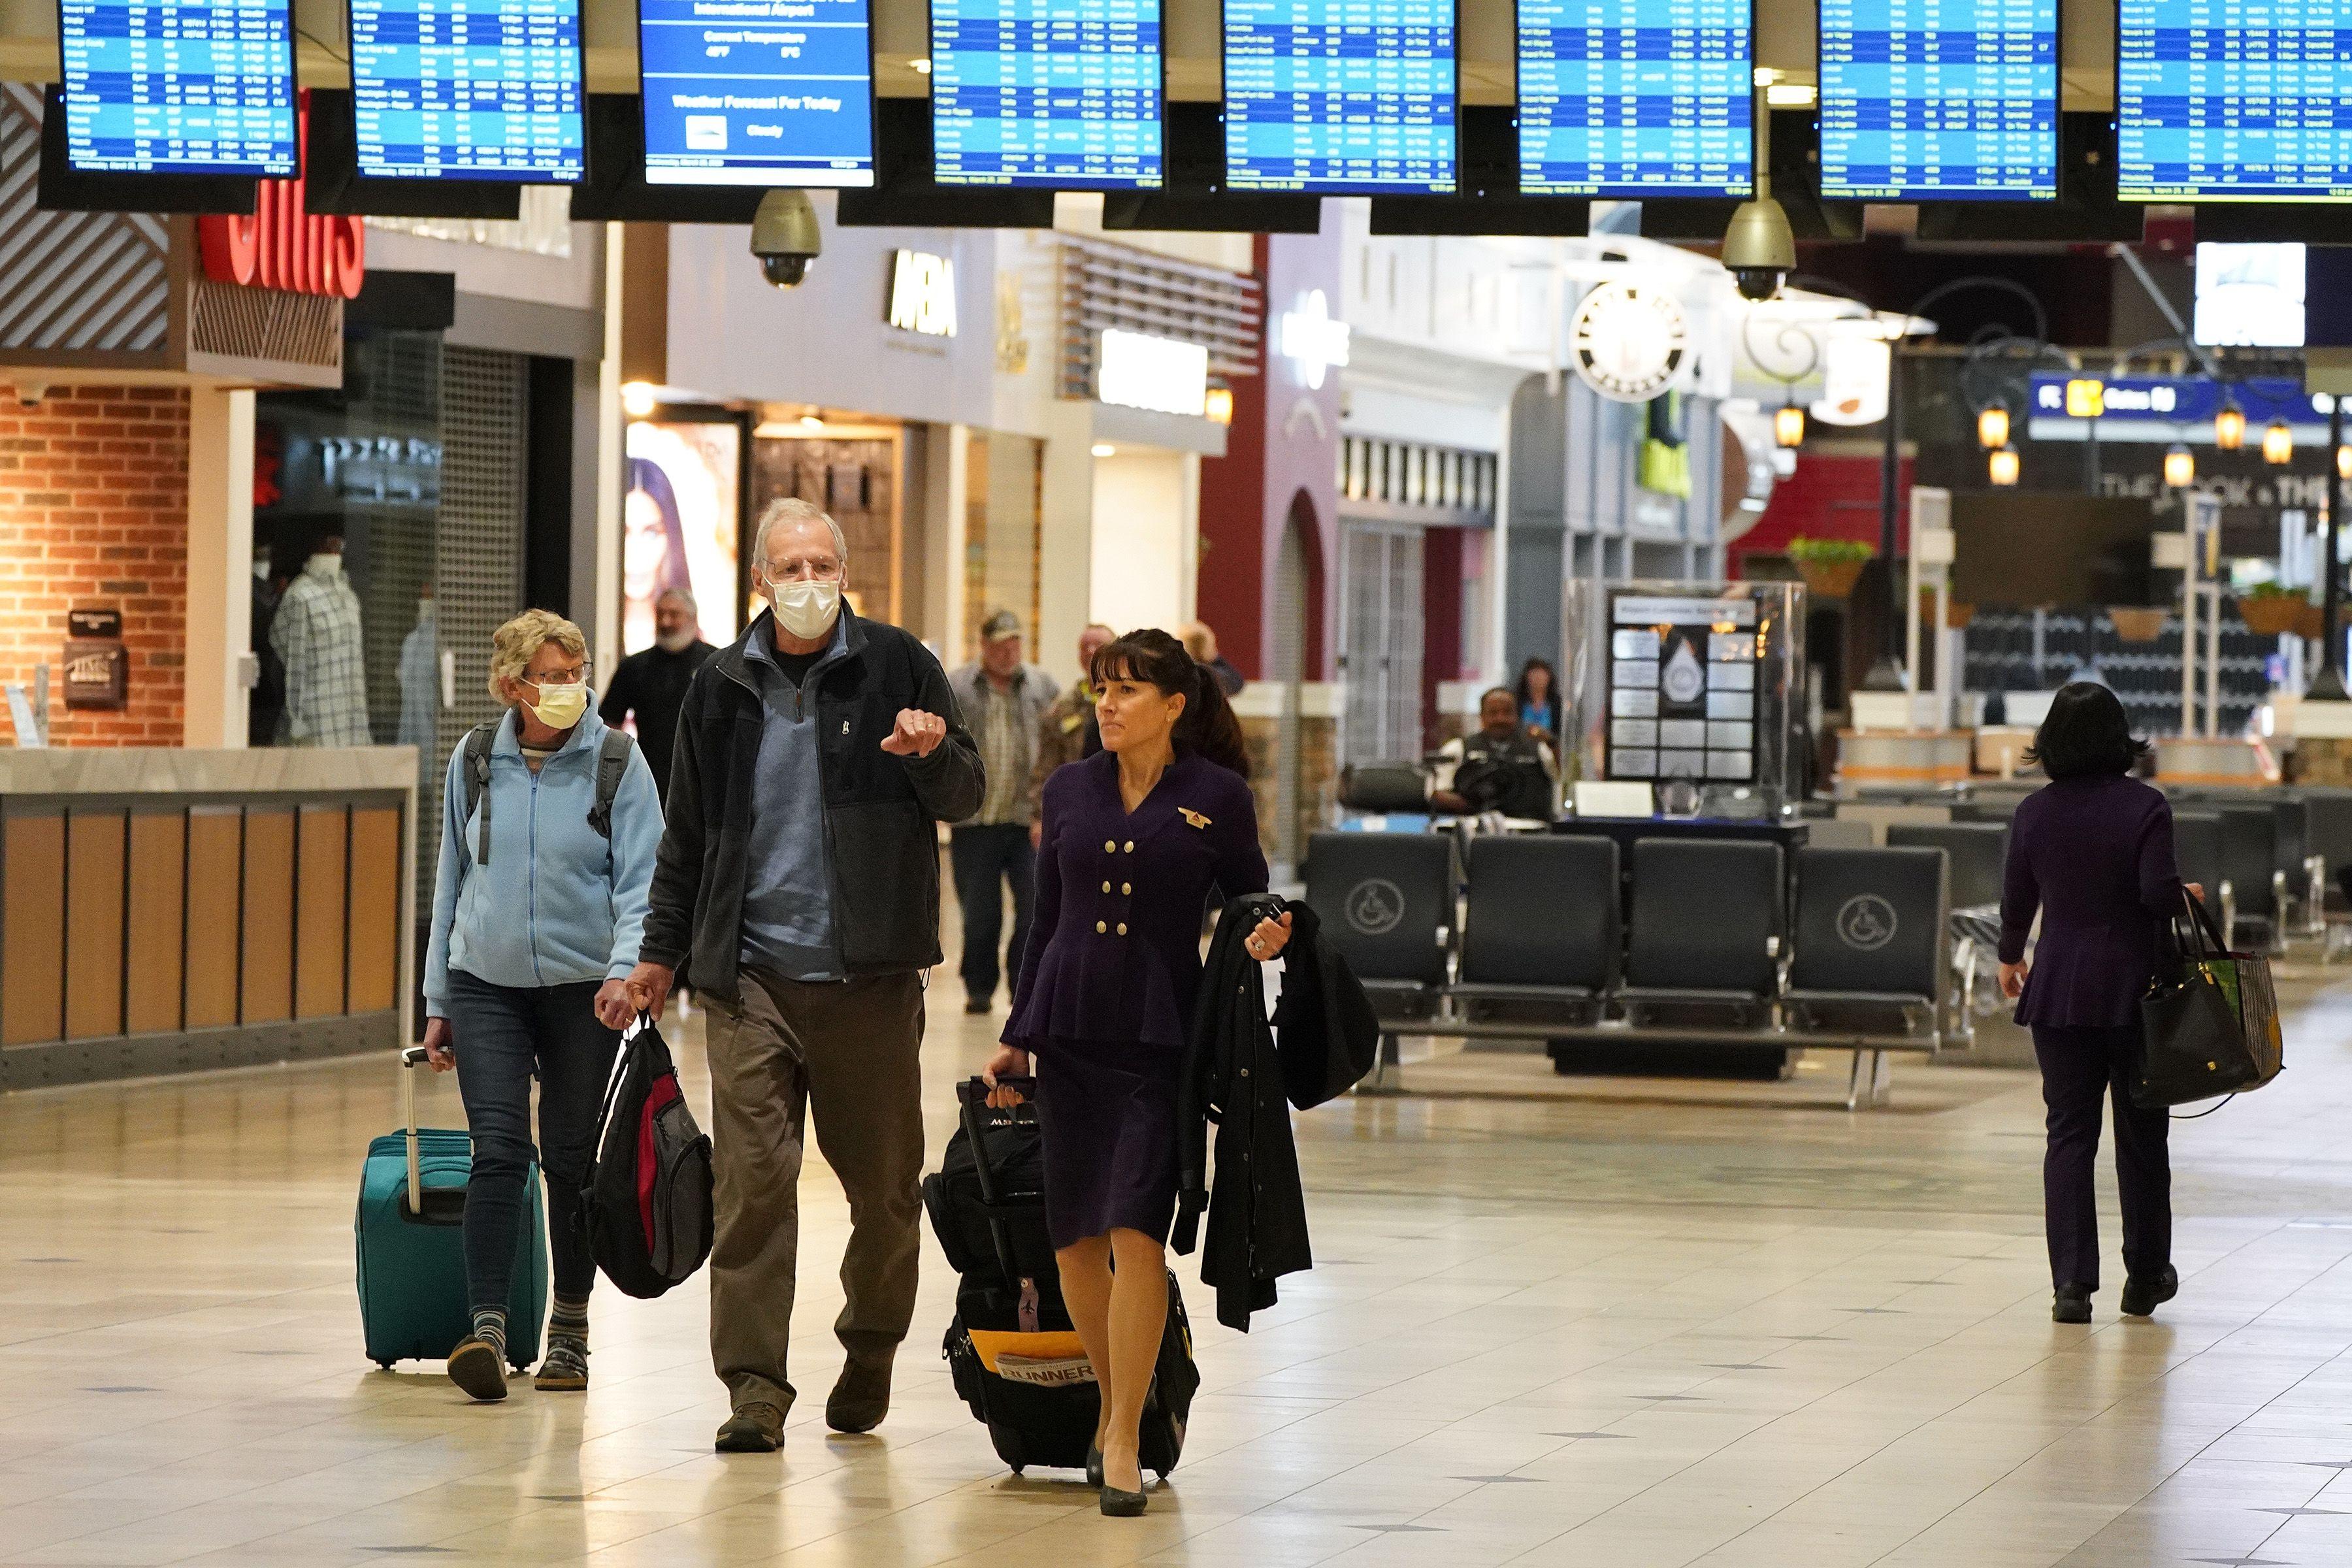 DOT won't enforce cash refunds for flights canceled by coronavirus